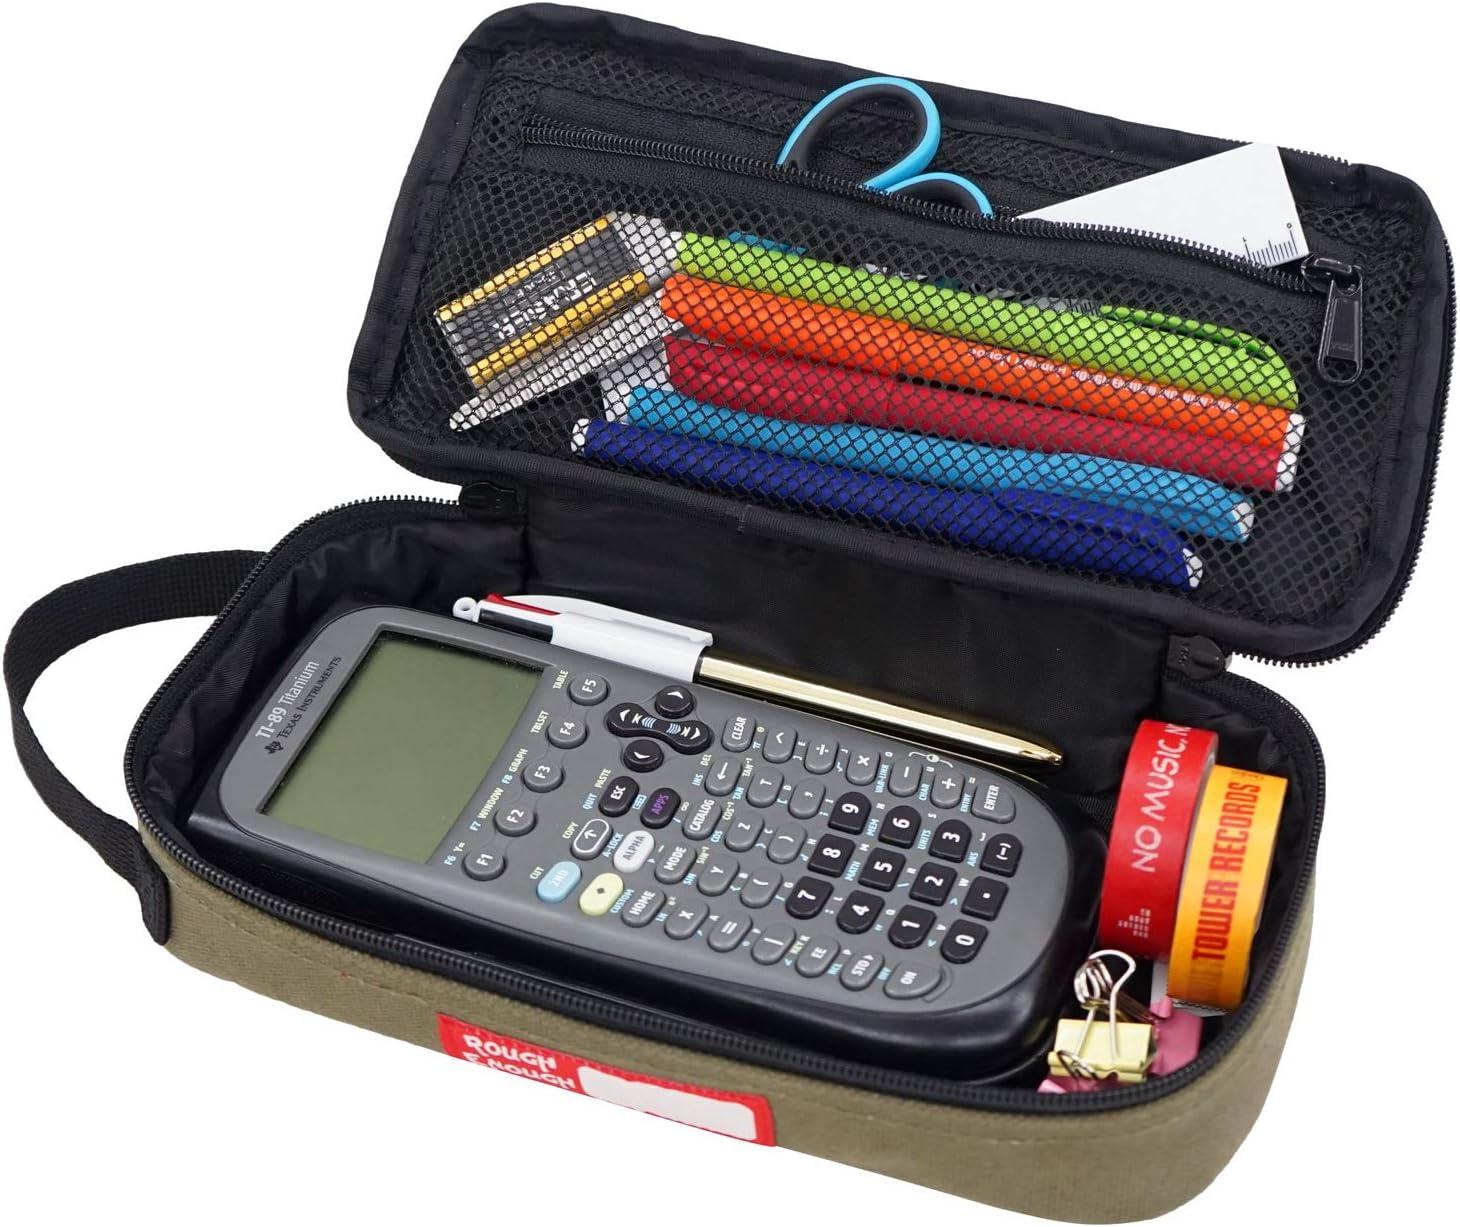 Rough Enough Mesh Pen Case Adaptor Pouch Set Black by ROUGH ENOUGH